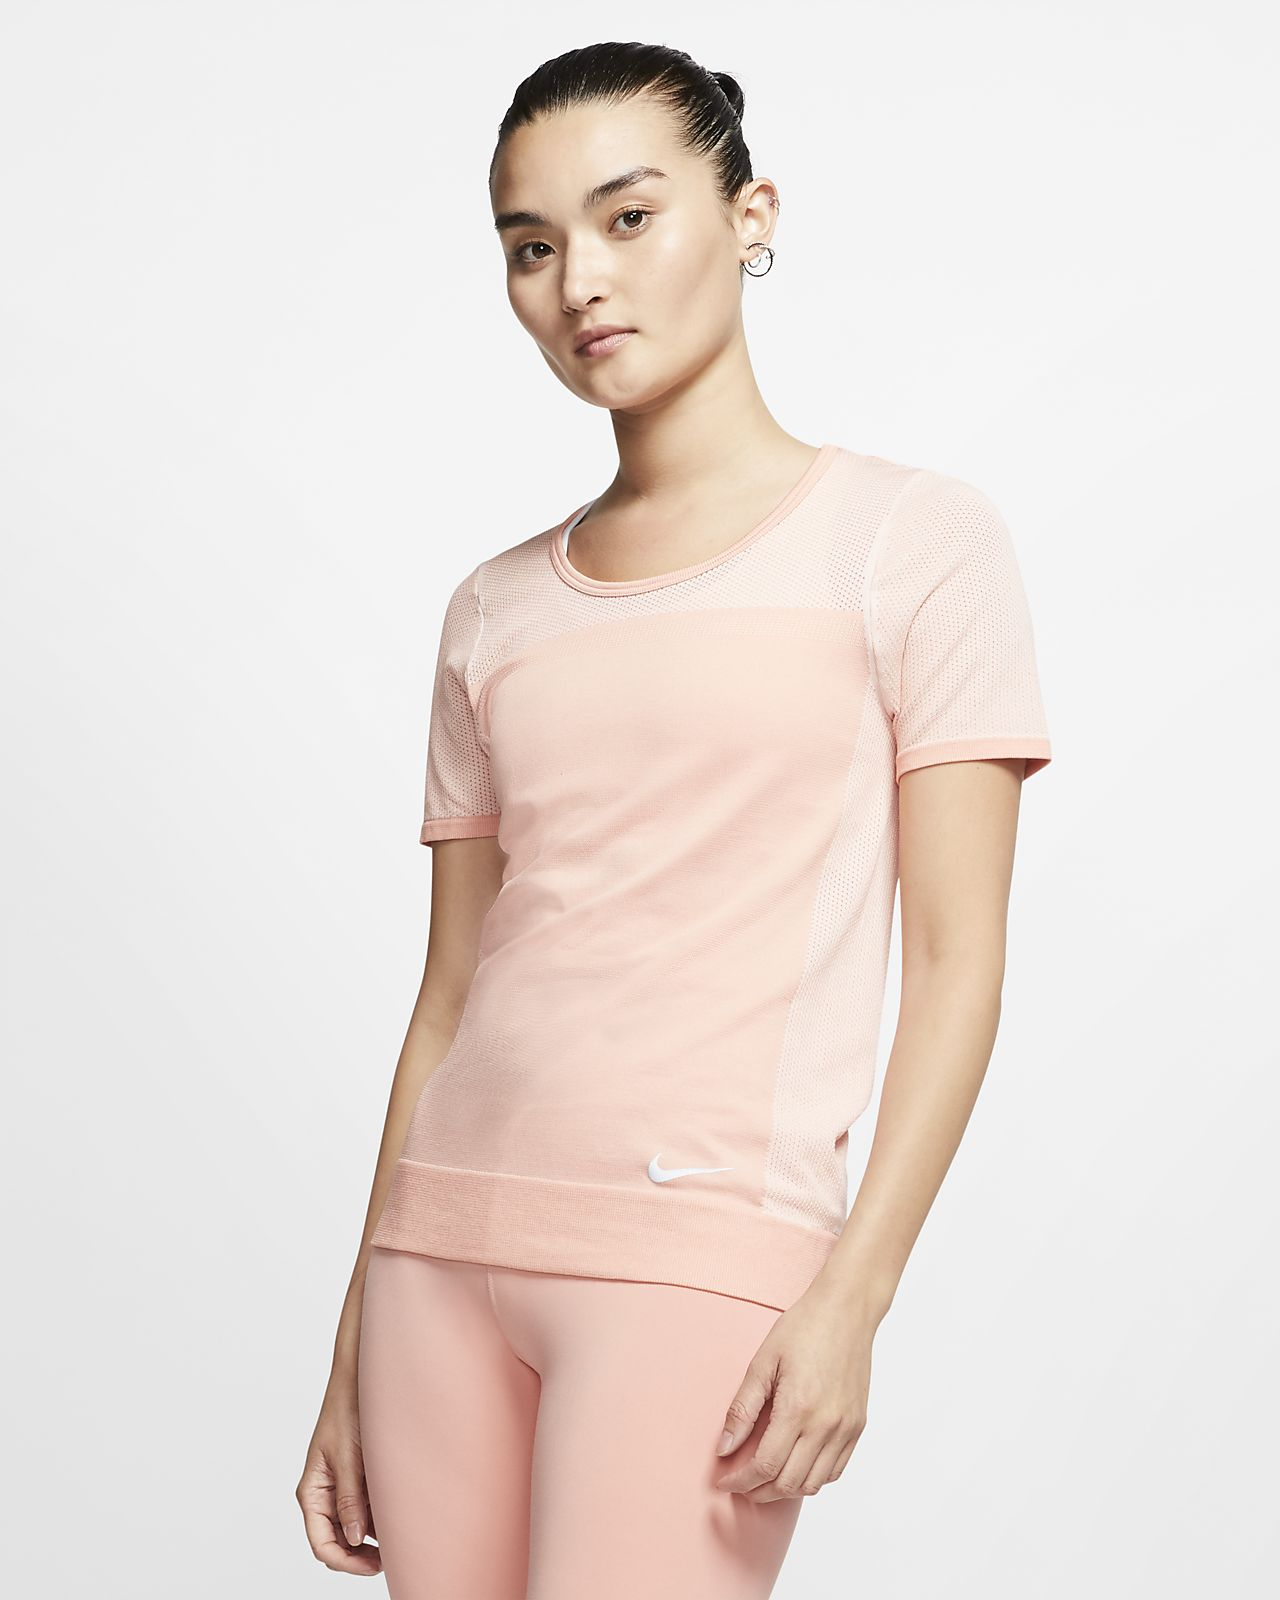 Nike Infinite Hardlooptop met korte mouwen voor dames